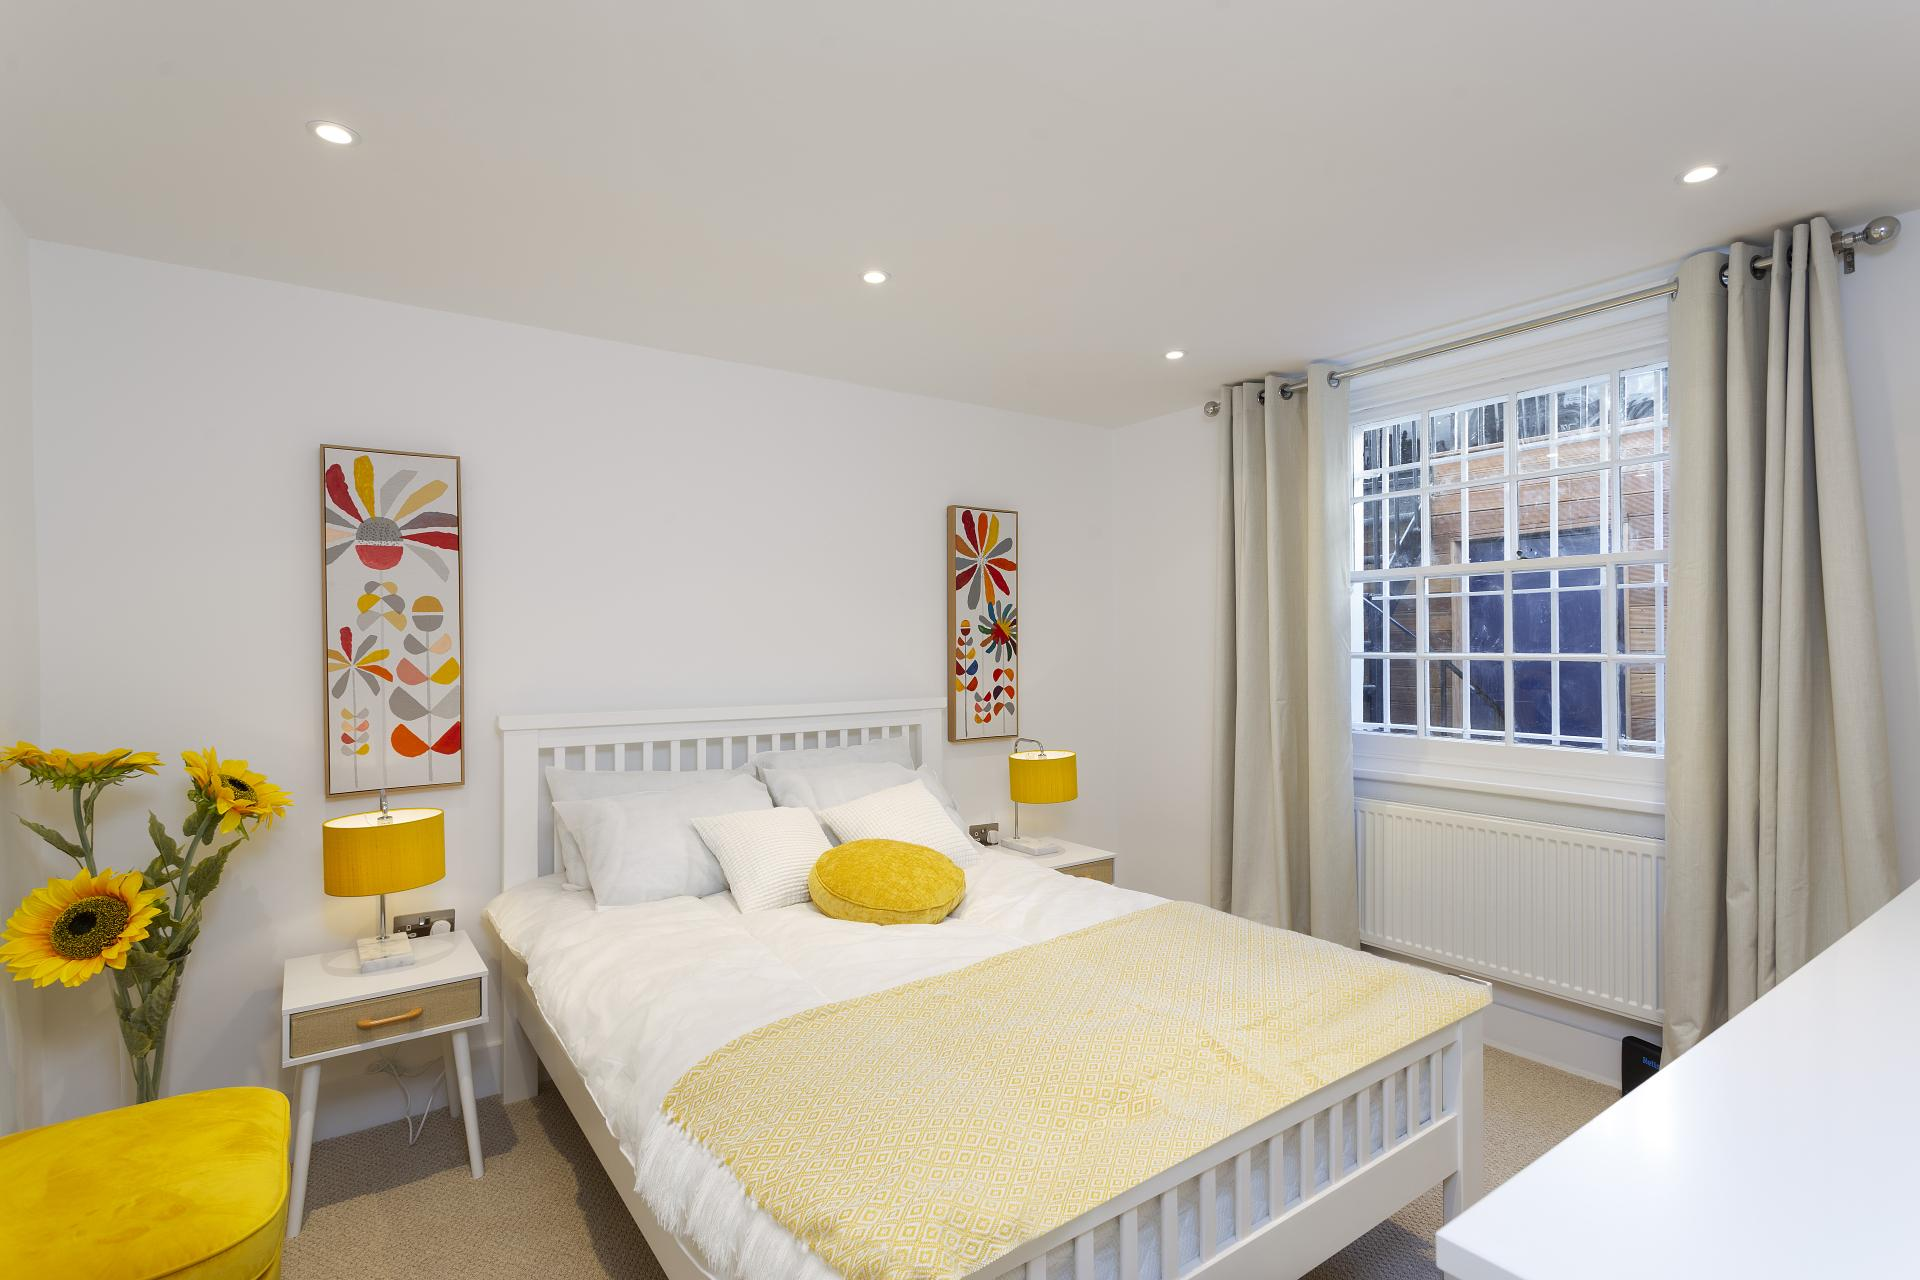 Bedroom at Luxury Knightsbridge House, Knightsbridge, London - Citybase Apartments